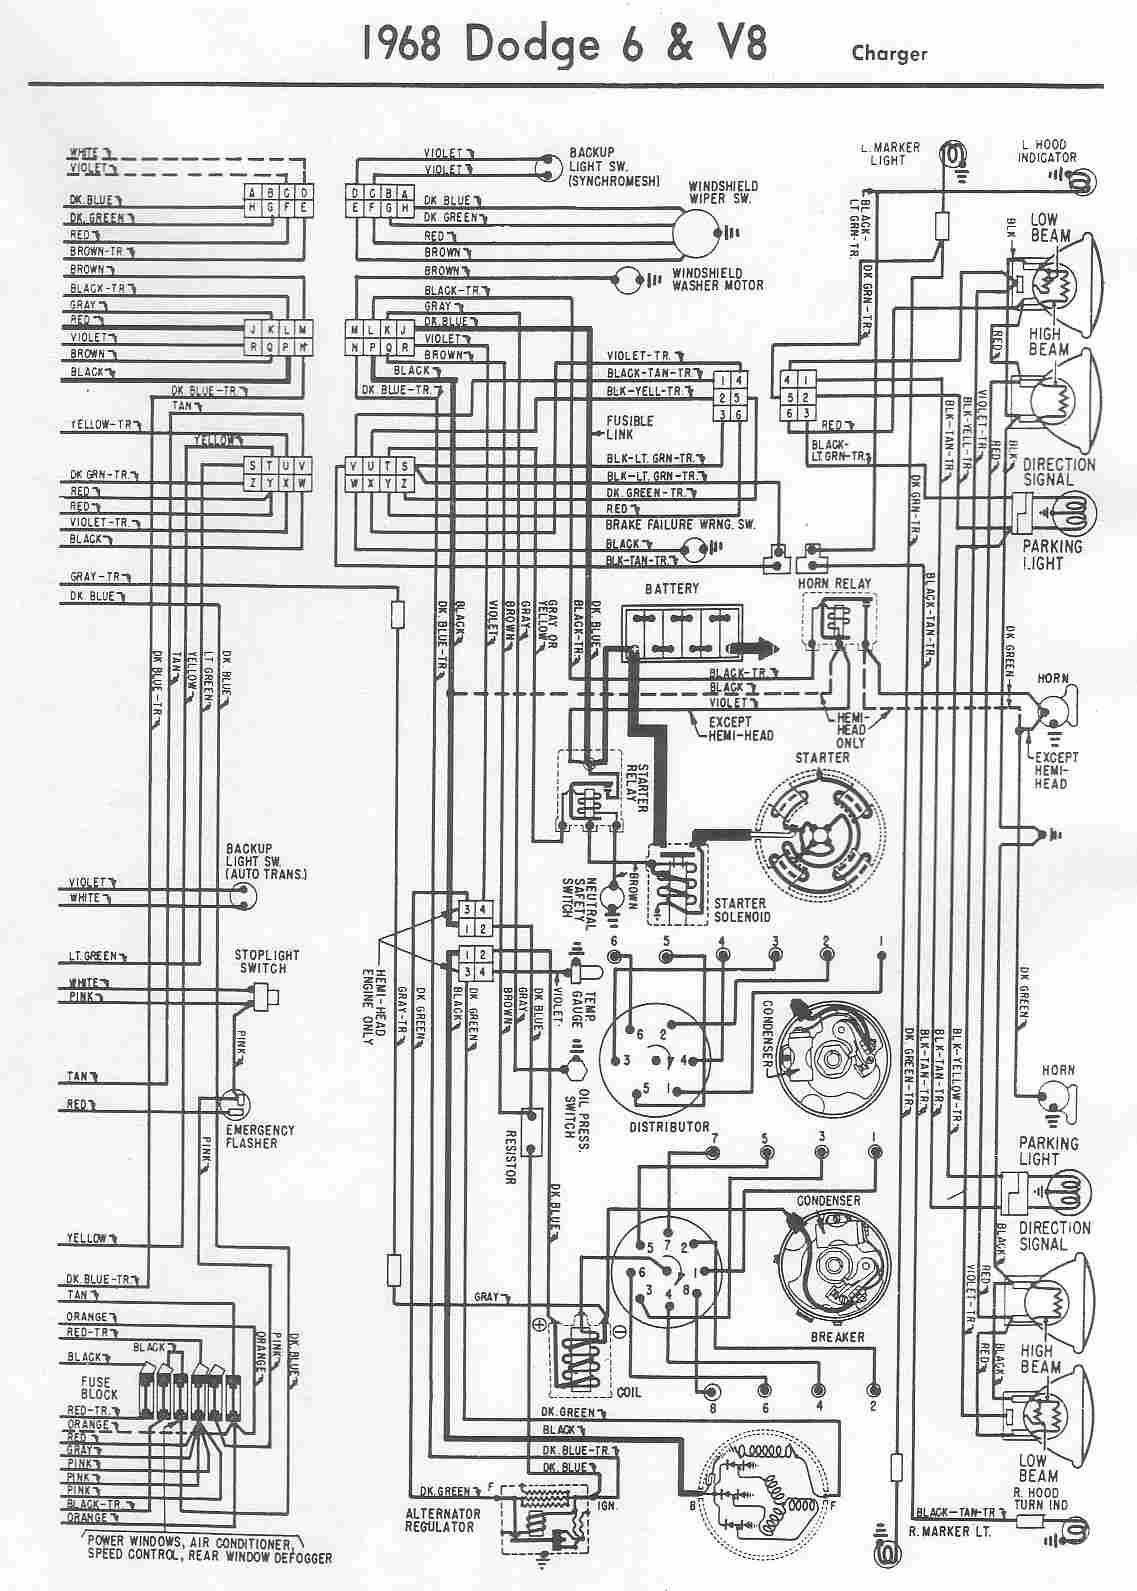 2007 dodge van wiring diagrams